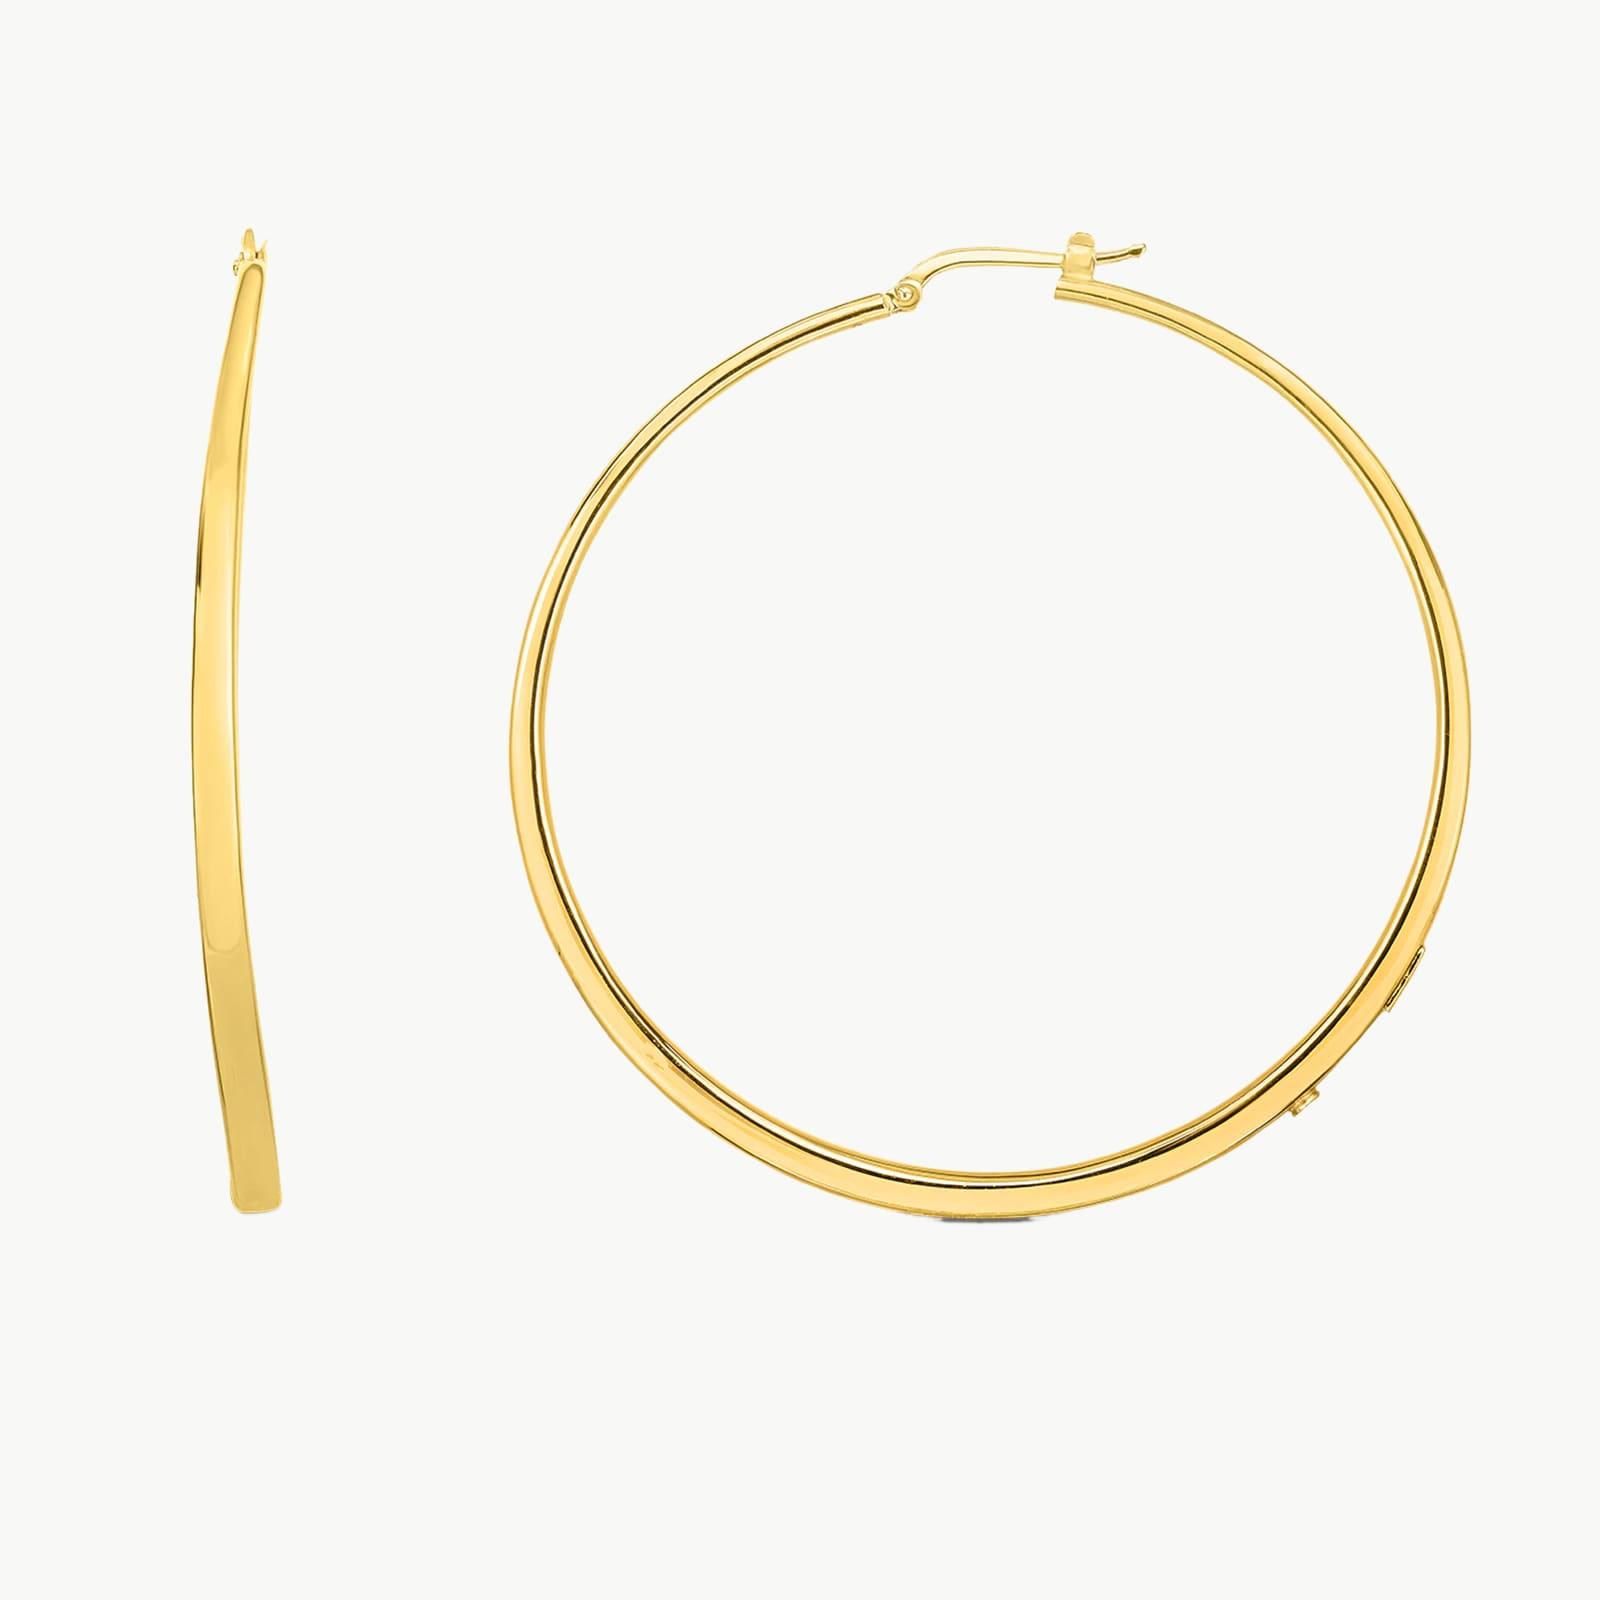 18k Yellow Gold 60mm Hoop Earrings